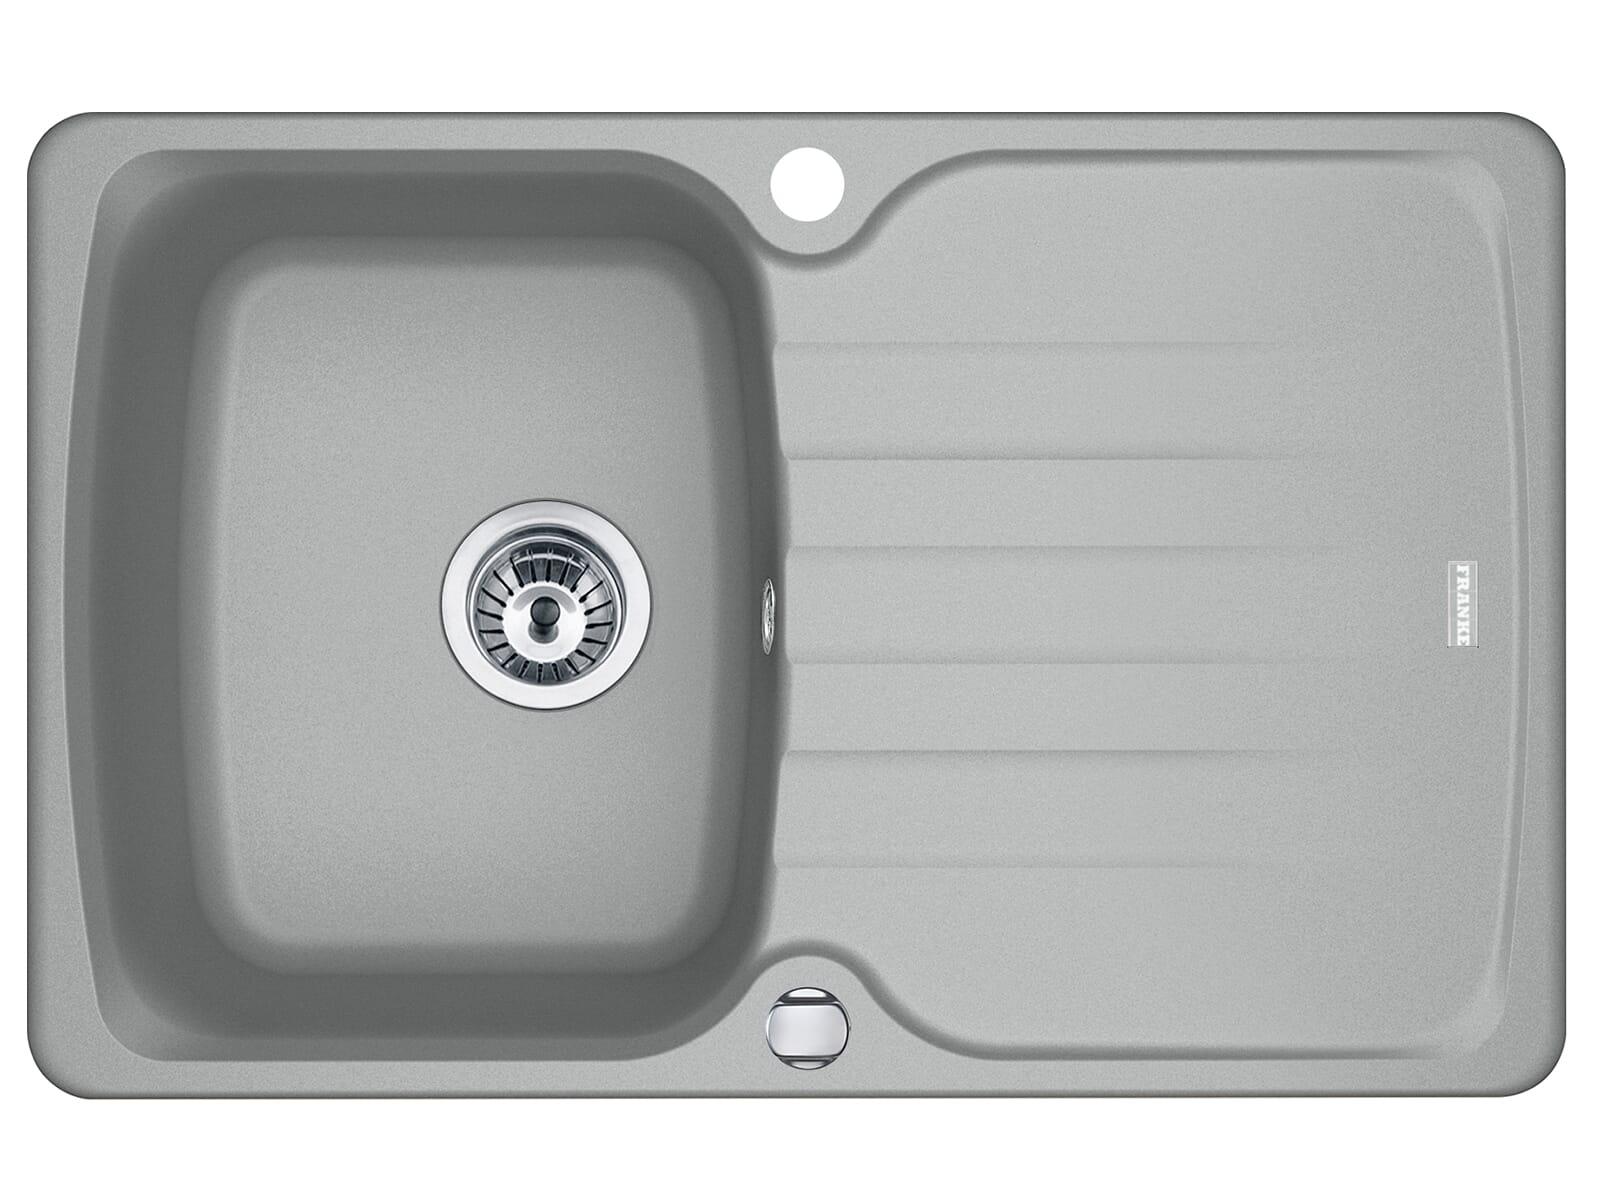 Franke Antea AZG 611-78 Steingrau - 114.0512.158 Granitspüle Exzenterbetätigung